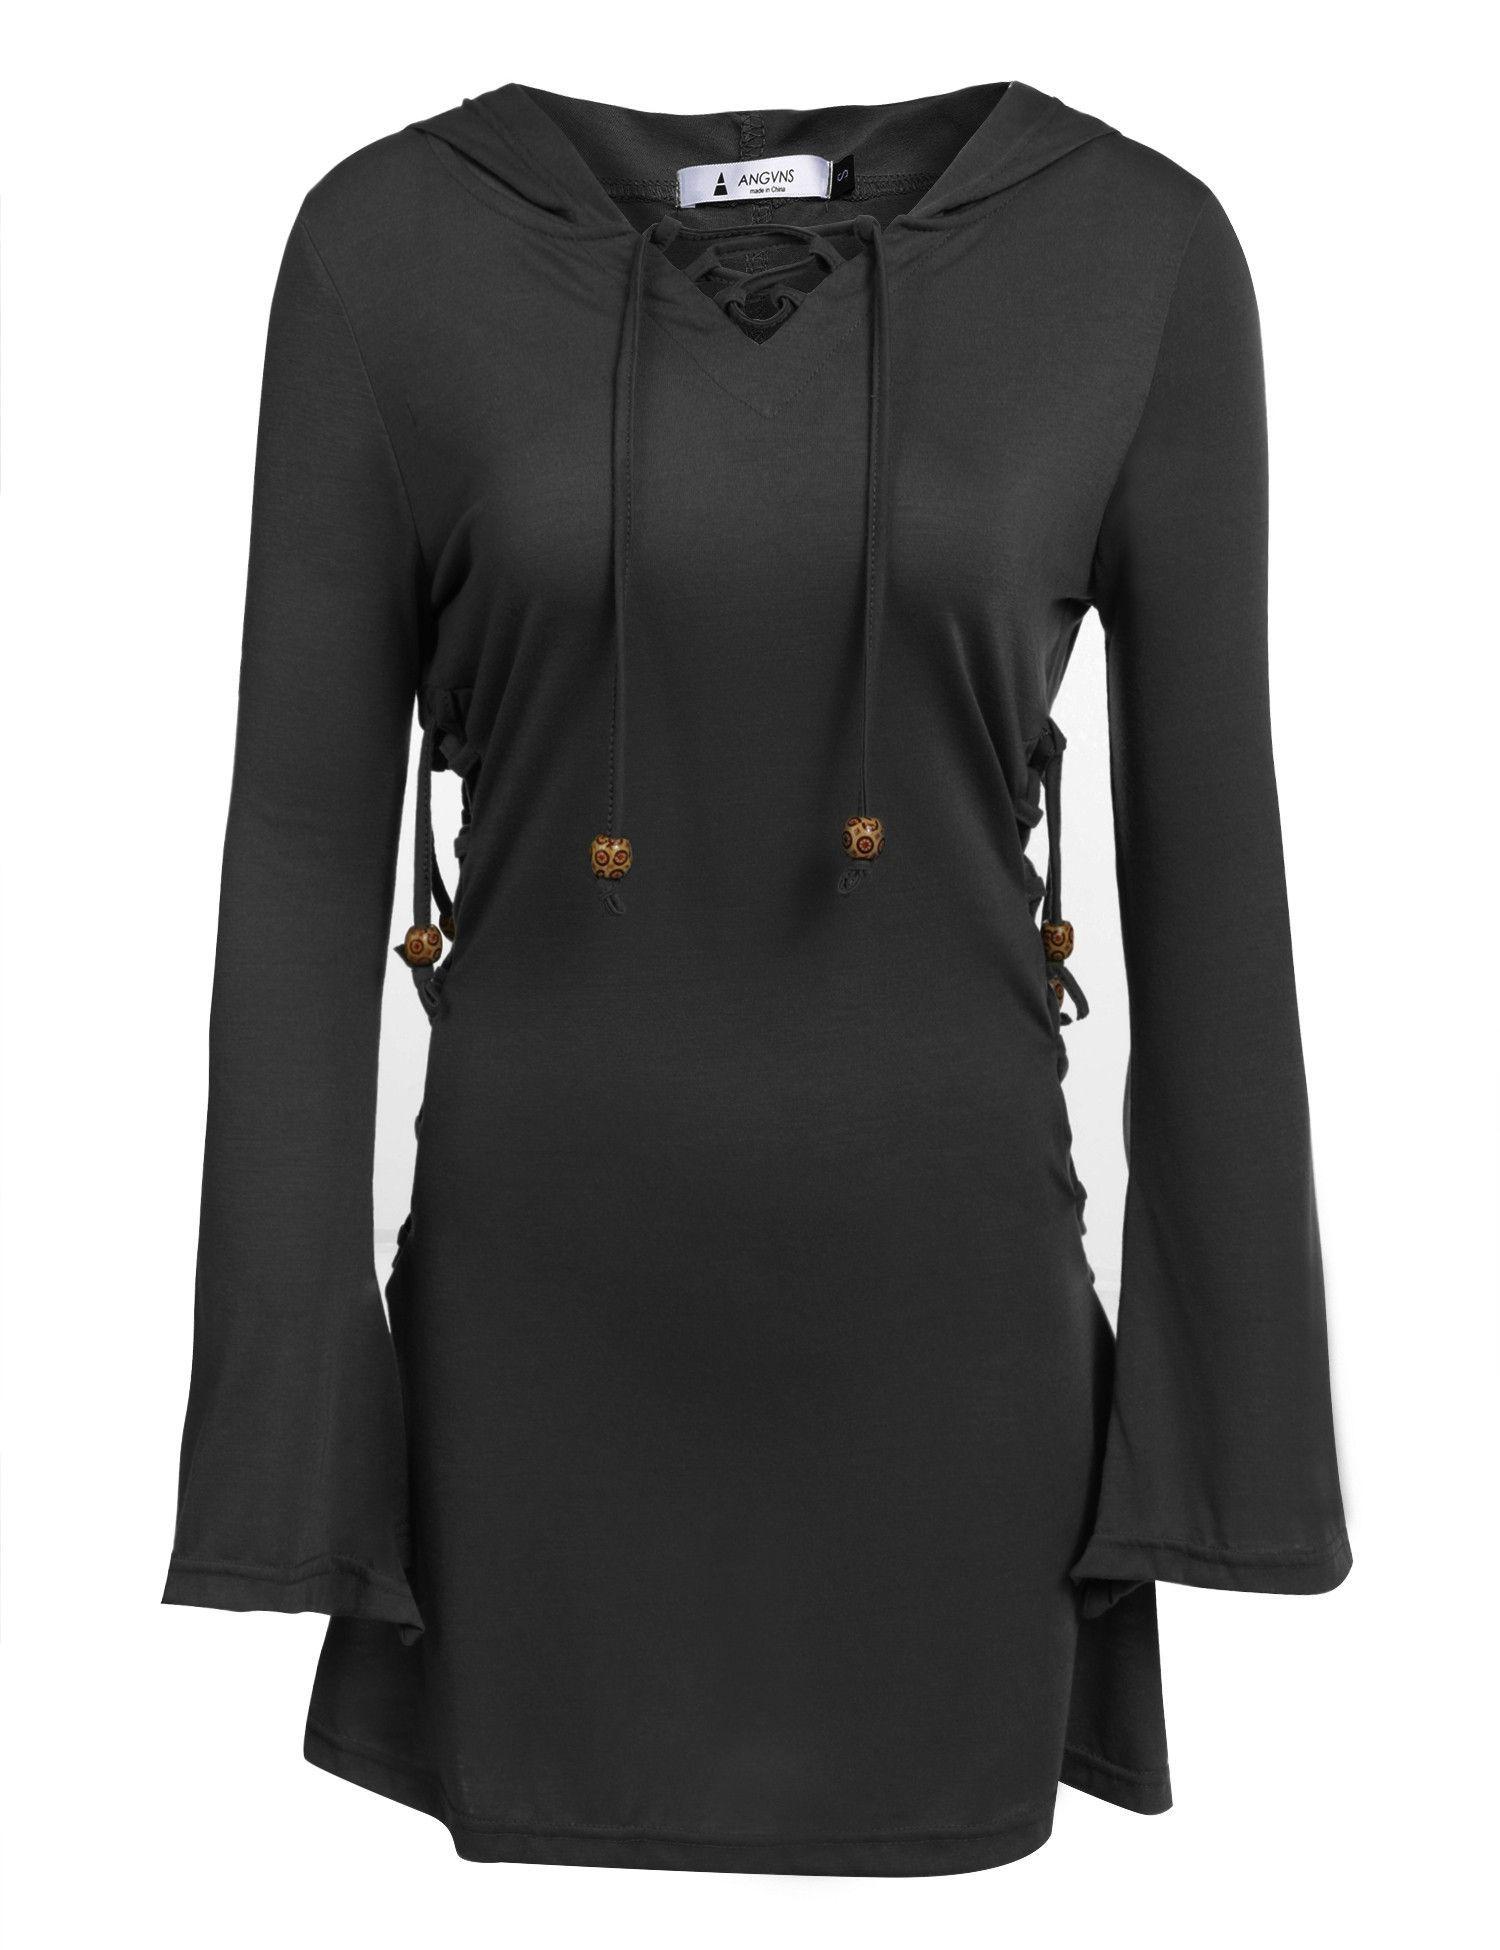 Black vneck long sleeve solid lace up hoodie mini dress